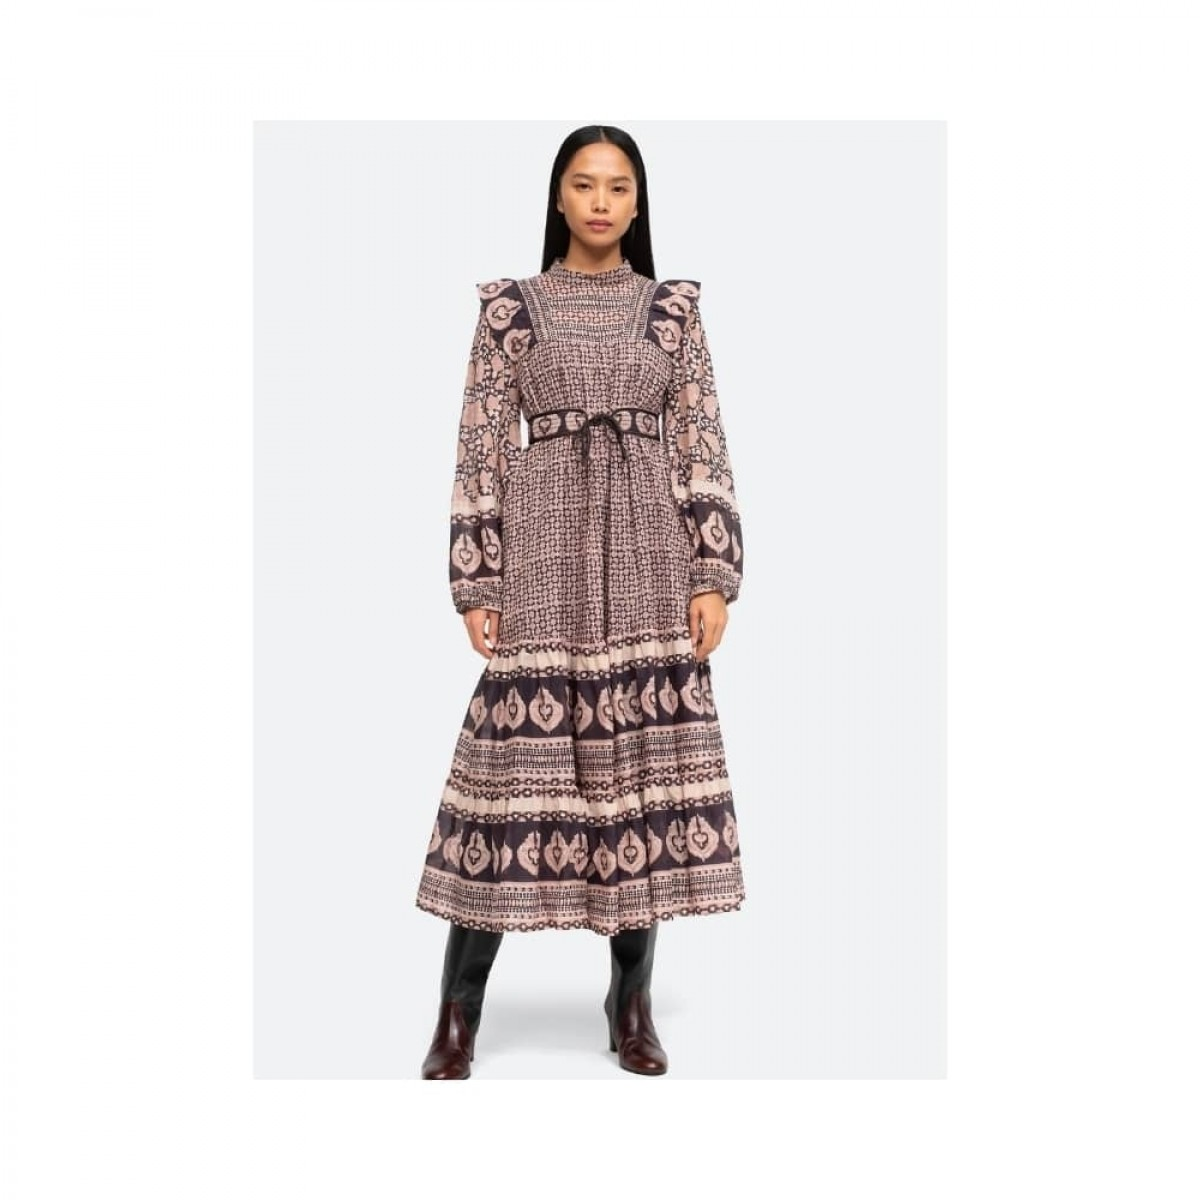 margo border dress - lilac - model front